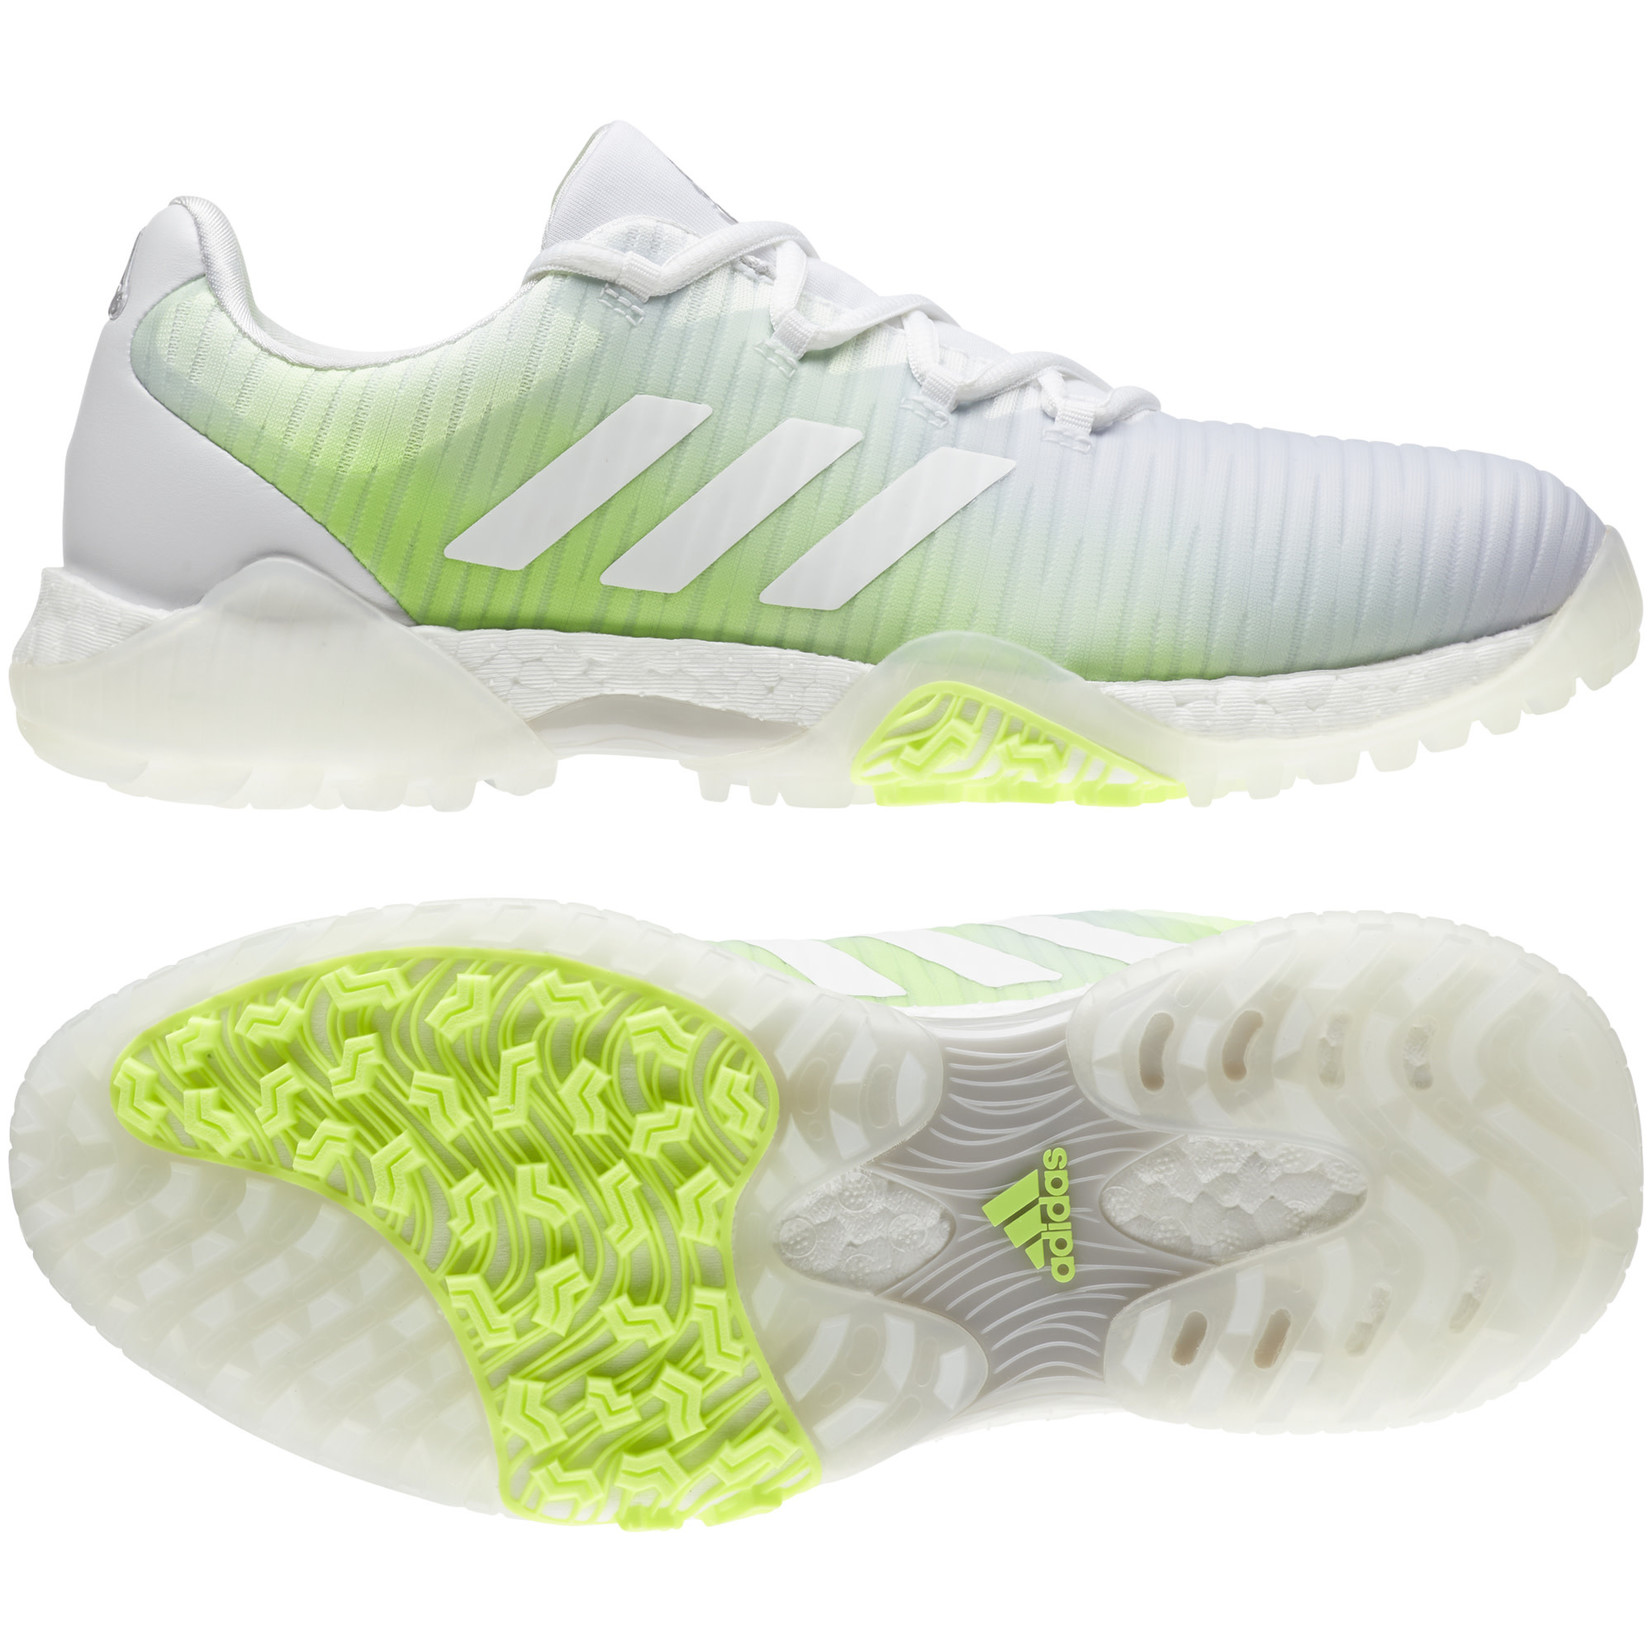 Adidas Adidas W Codechaos Wit/Groen UK 7 / 40